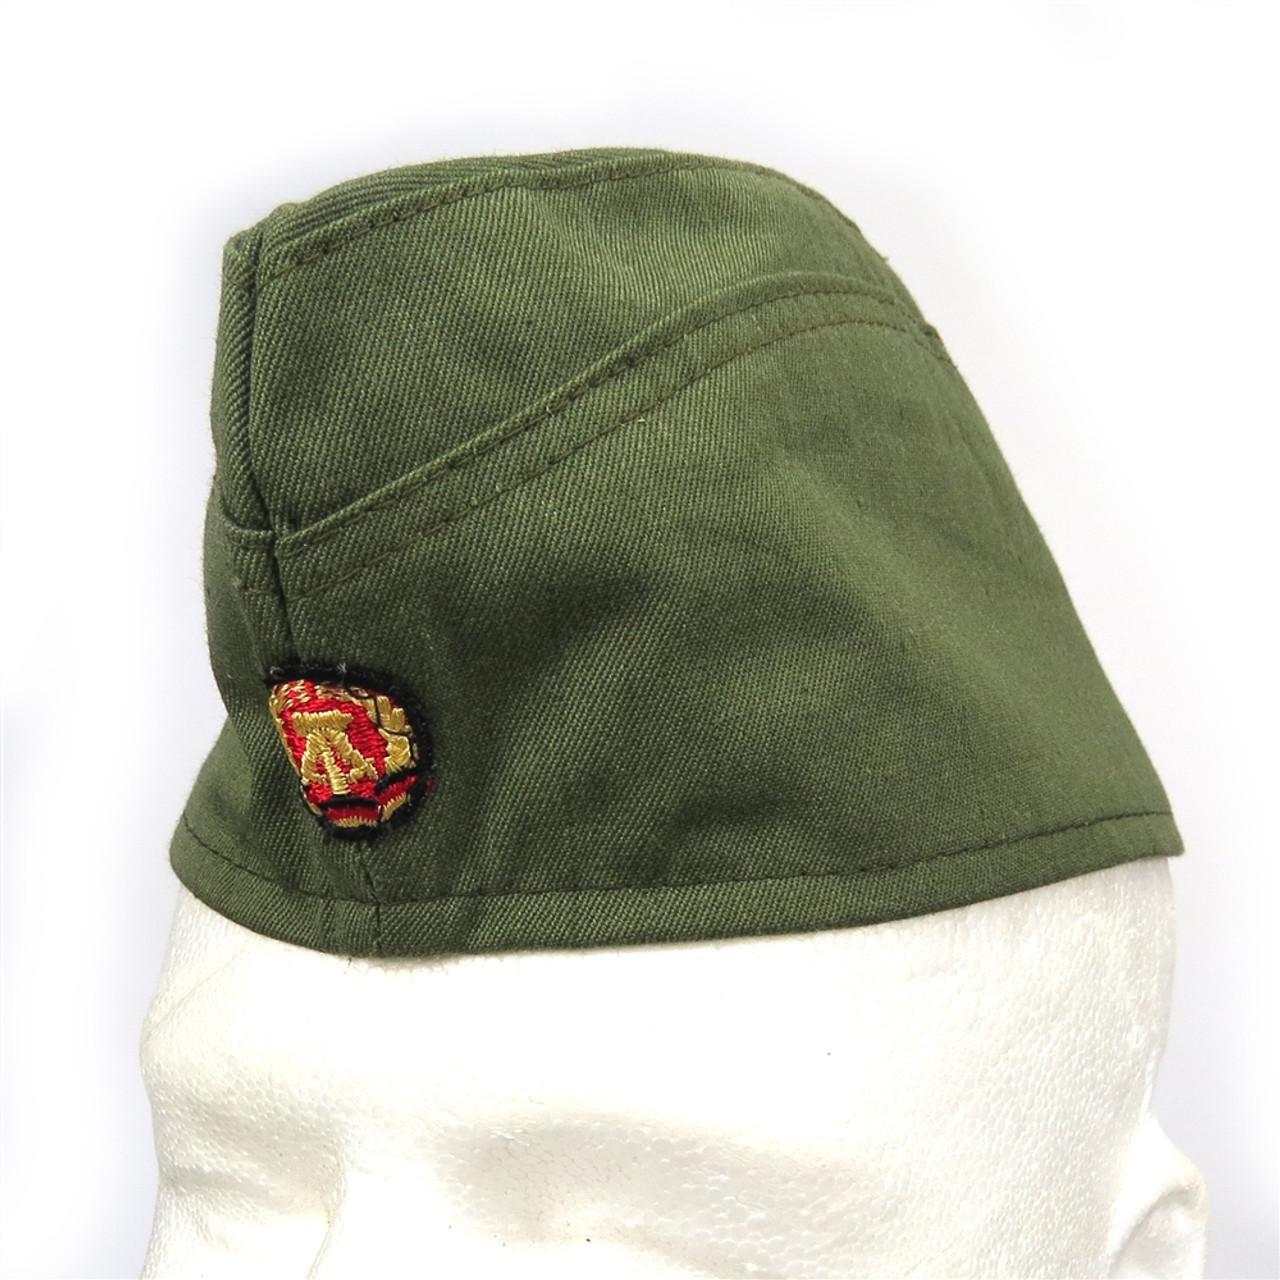 East German Army Summer Field Cap New New from Hessen Surplus